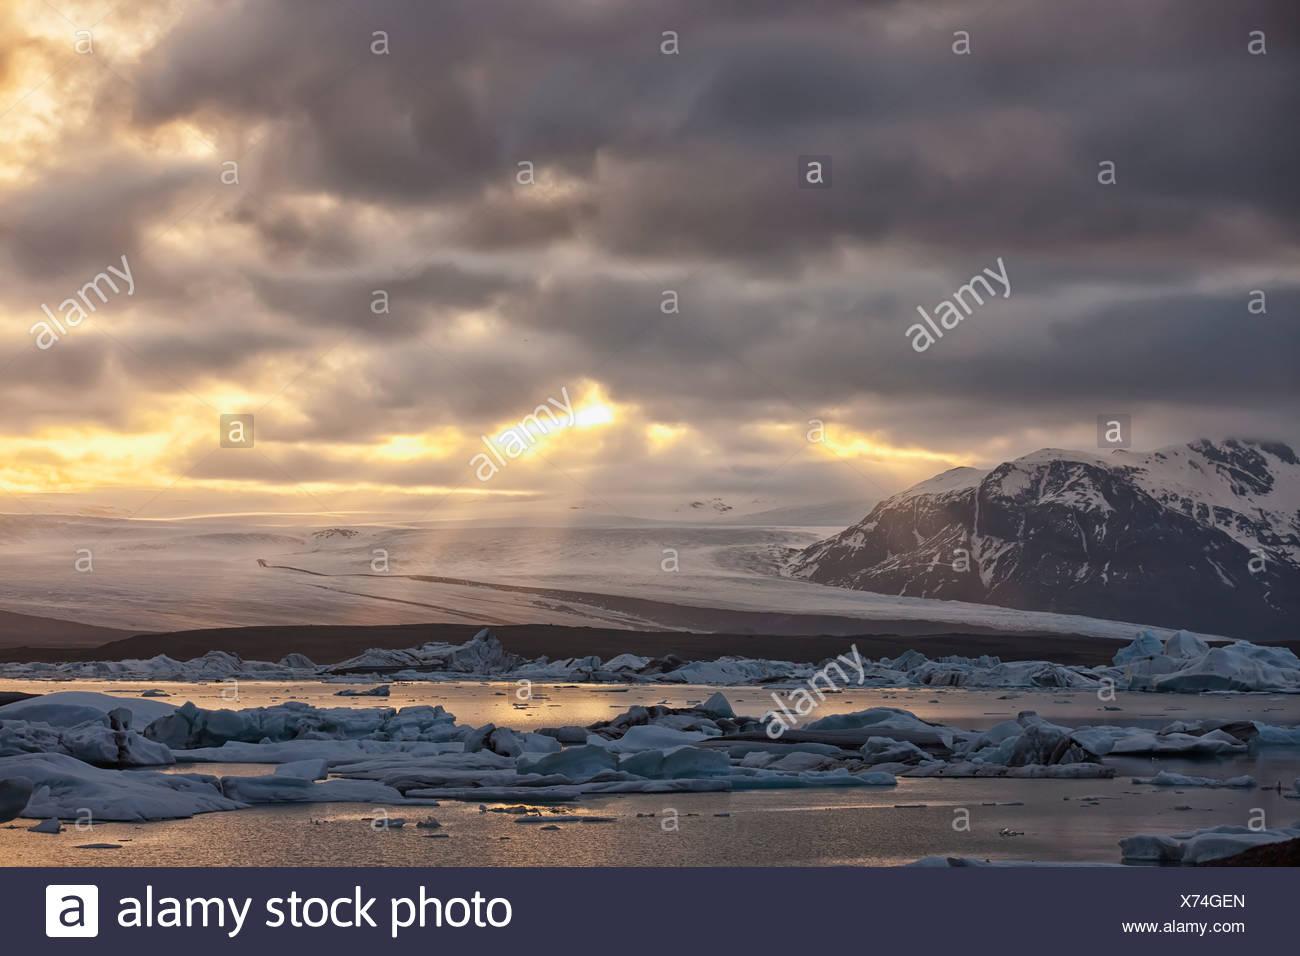 Shafts of sunlight shine on the ice calves floating in glacial lagoon jokulsarlon at the base of breioamerkurjokull; iceland - Stock Image